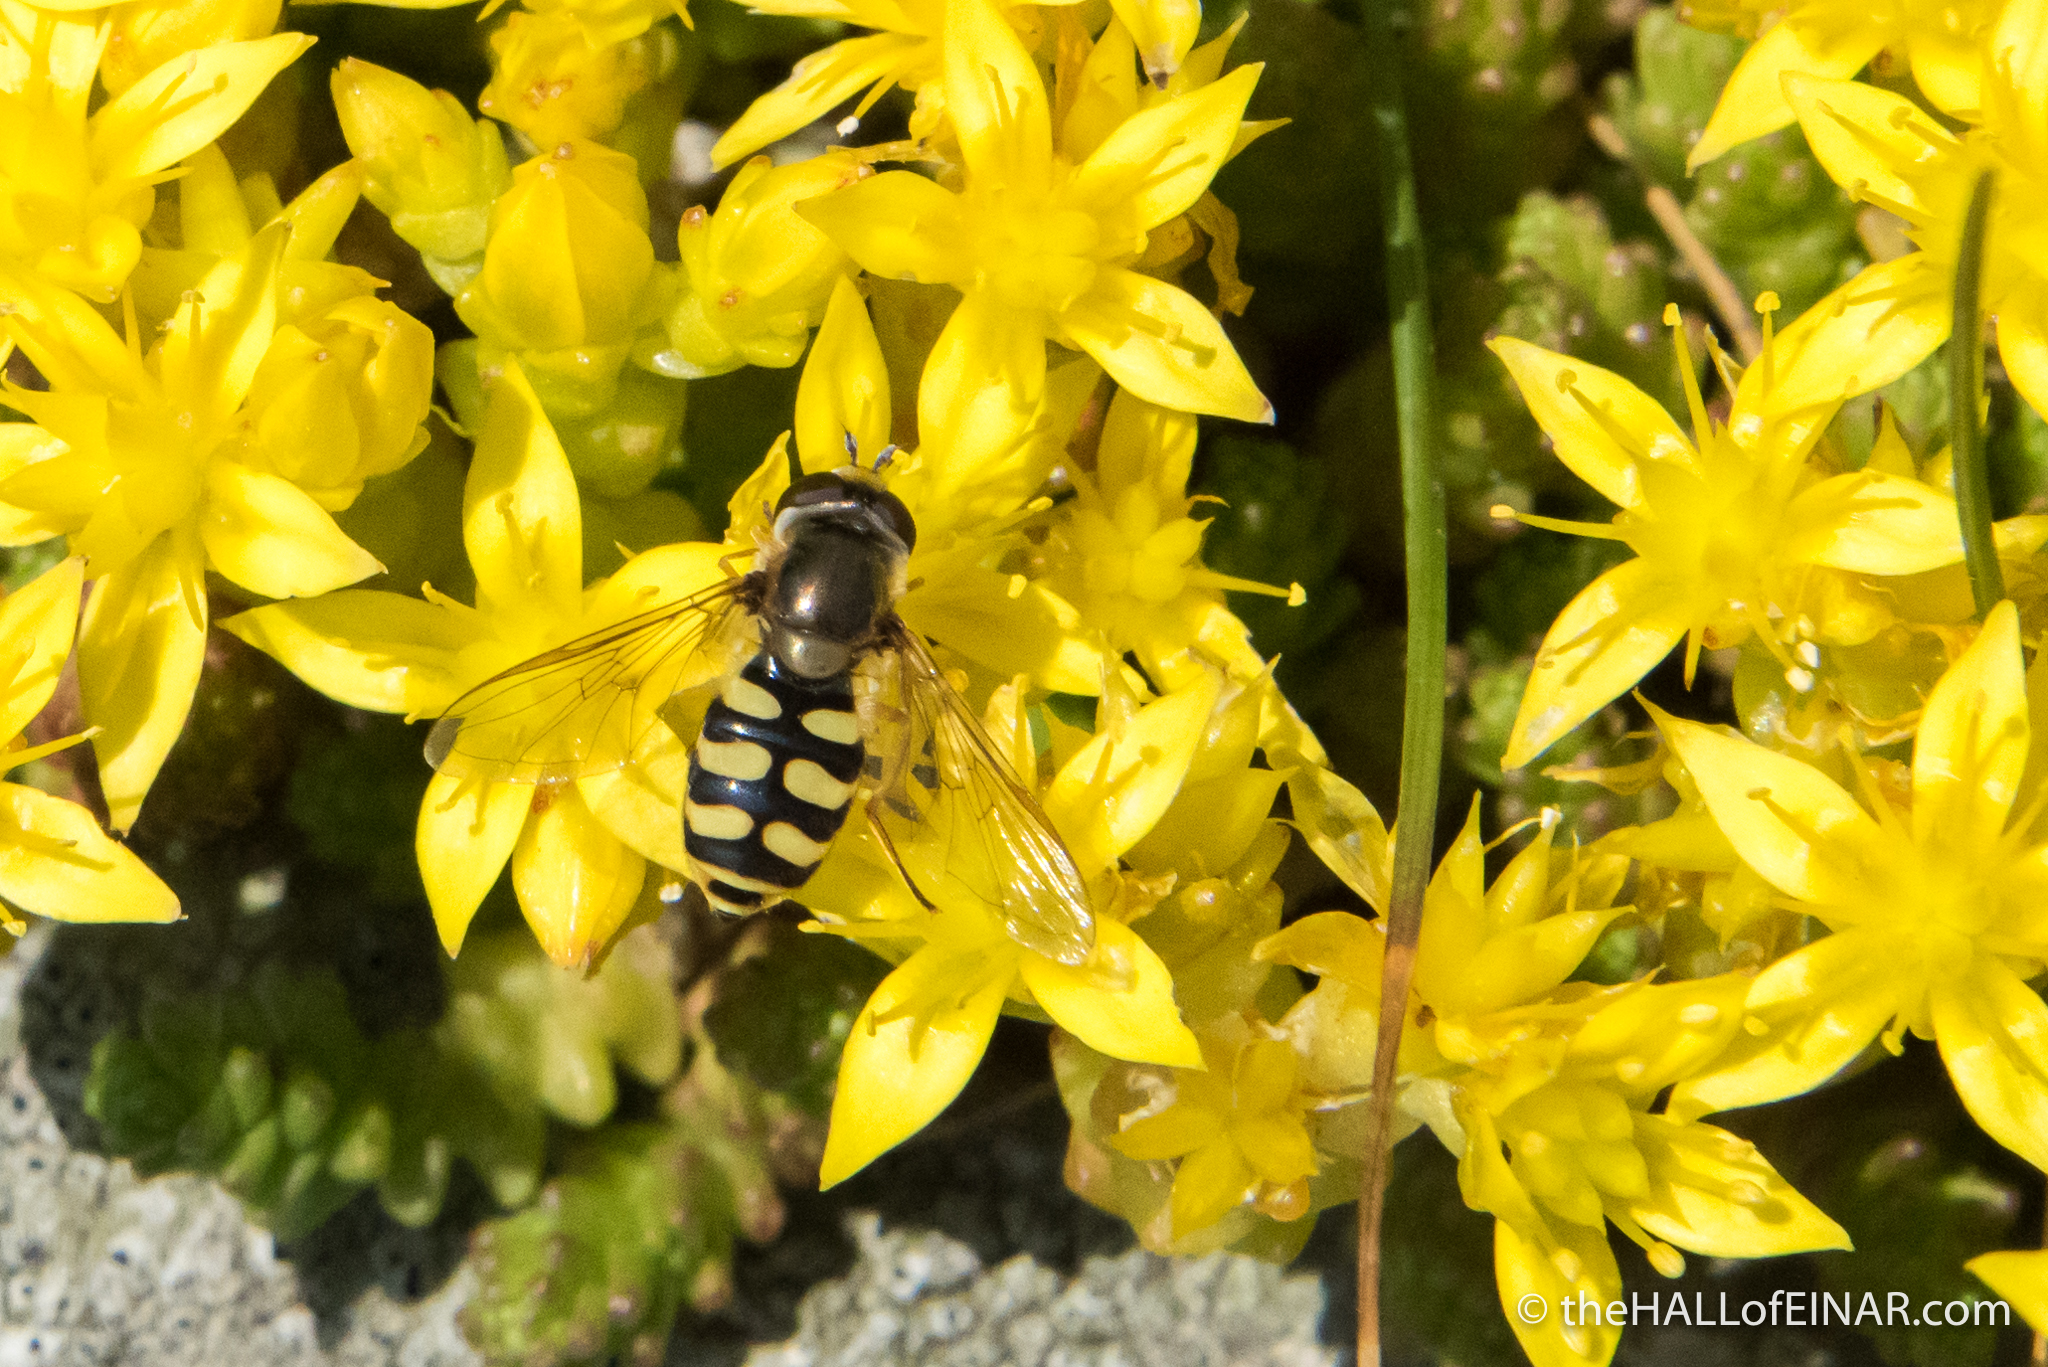 Eupeodes corollae - The Hall of Einar - photograph 9C) David Bailey (not the)